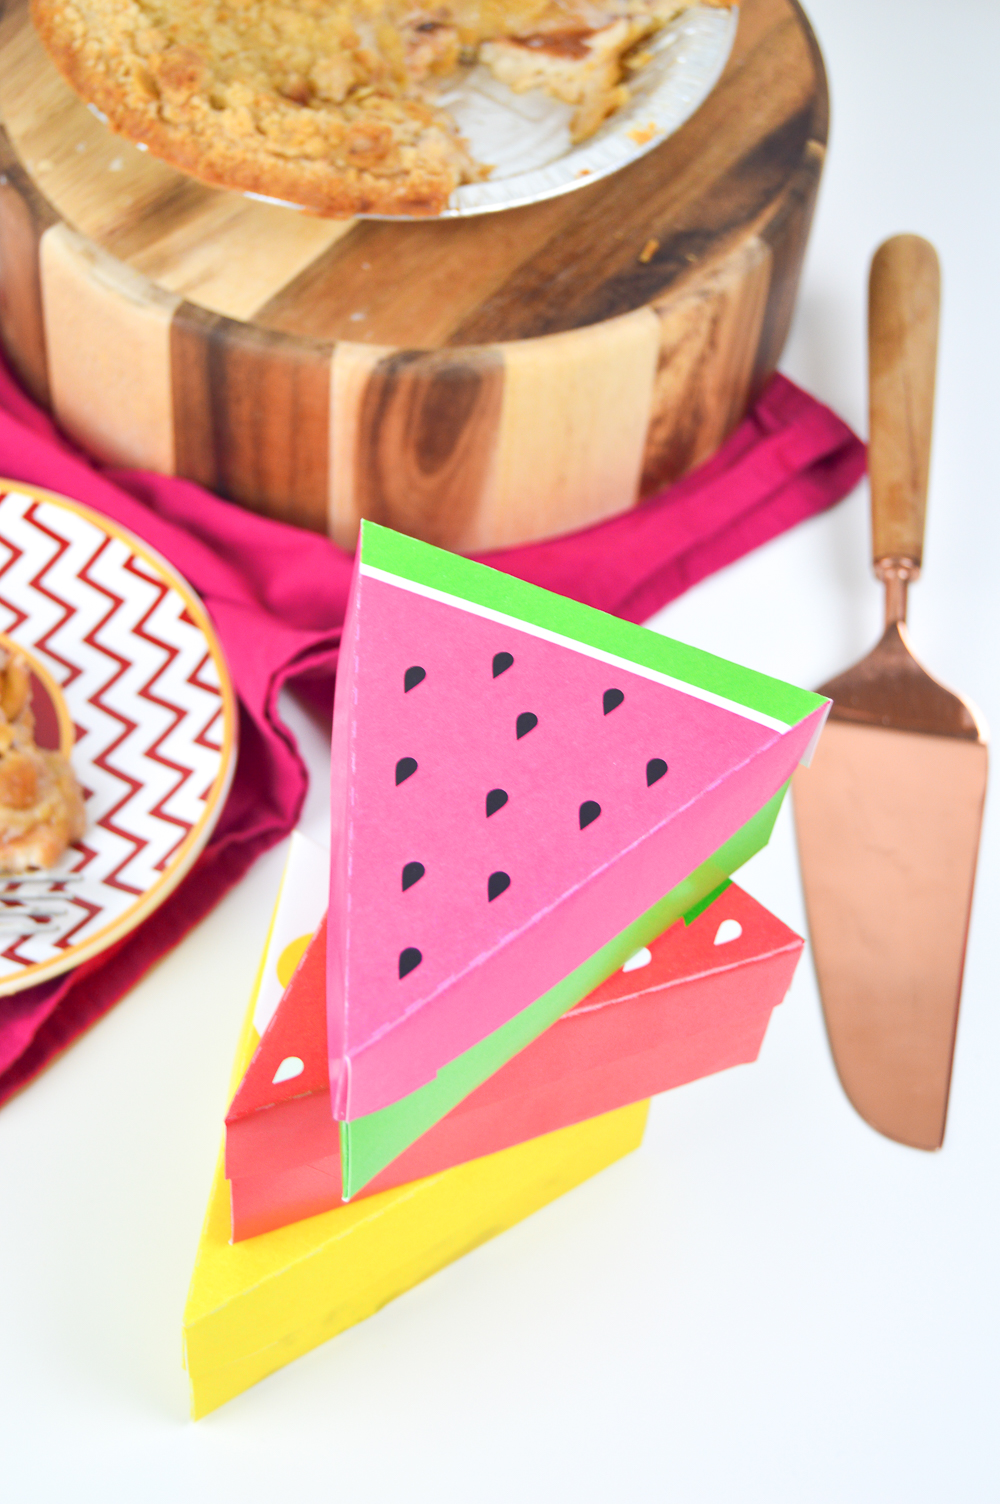 DIY Printable Fruit Slice Pie Boxes | Club Crafted